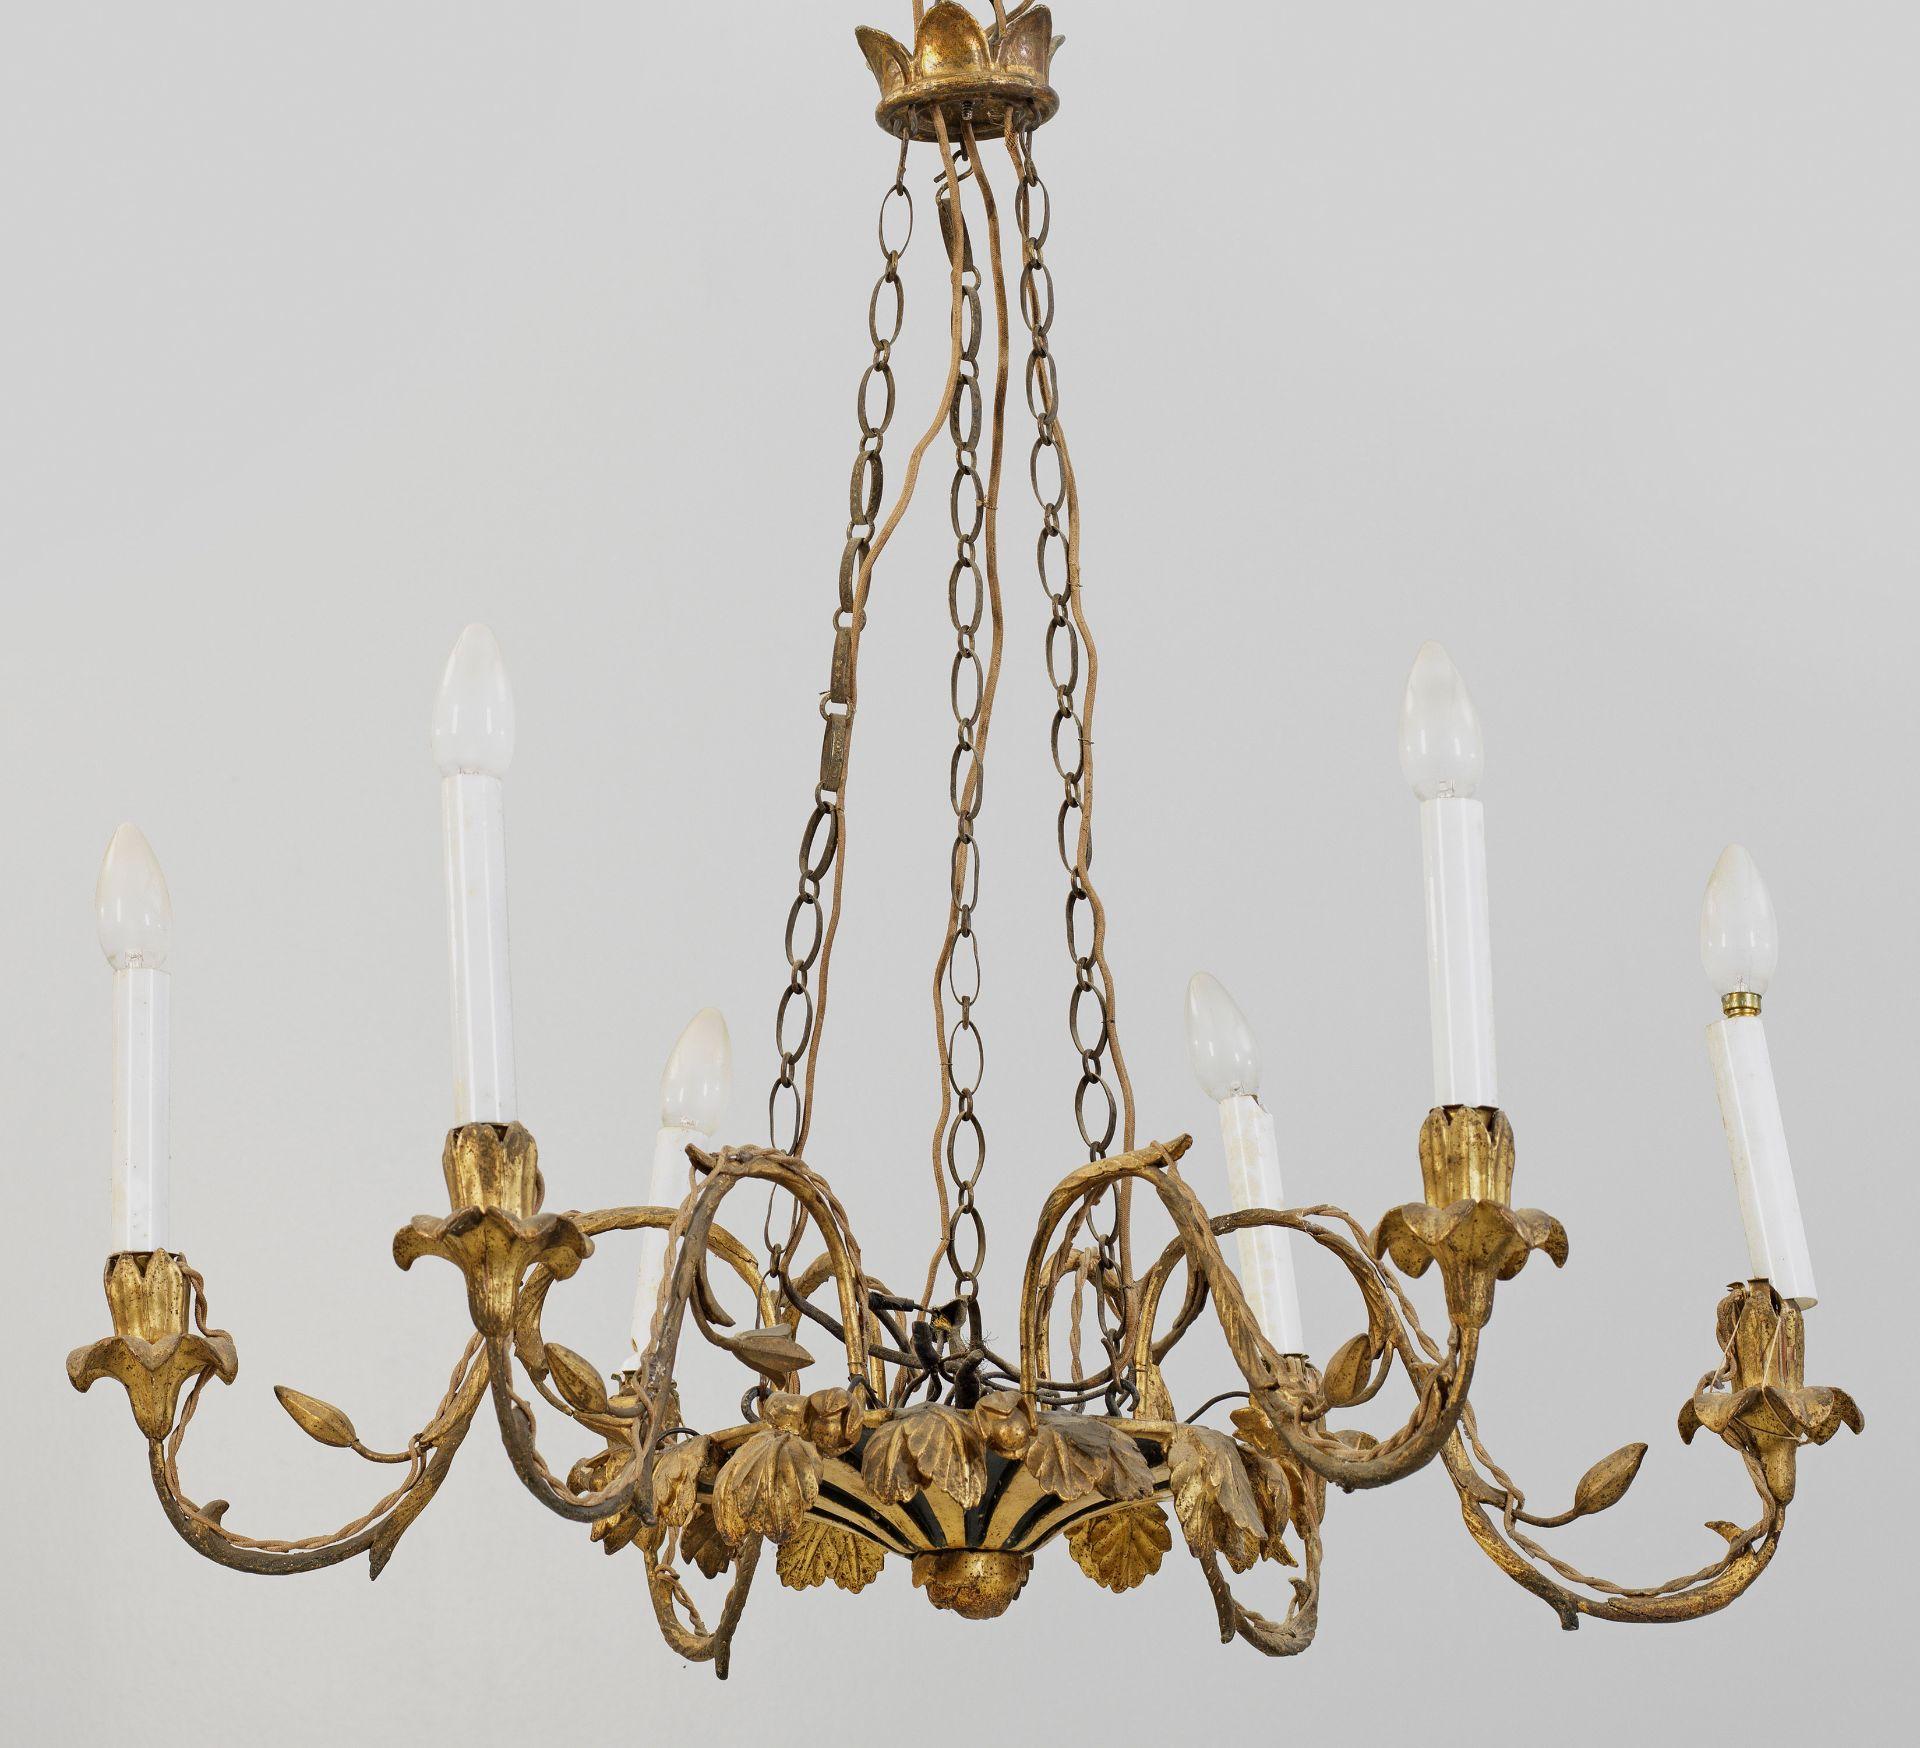 Biedermeier-Deckenlampe